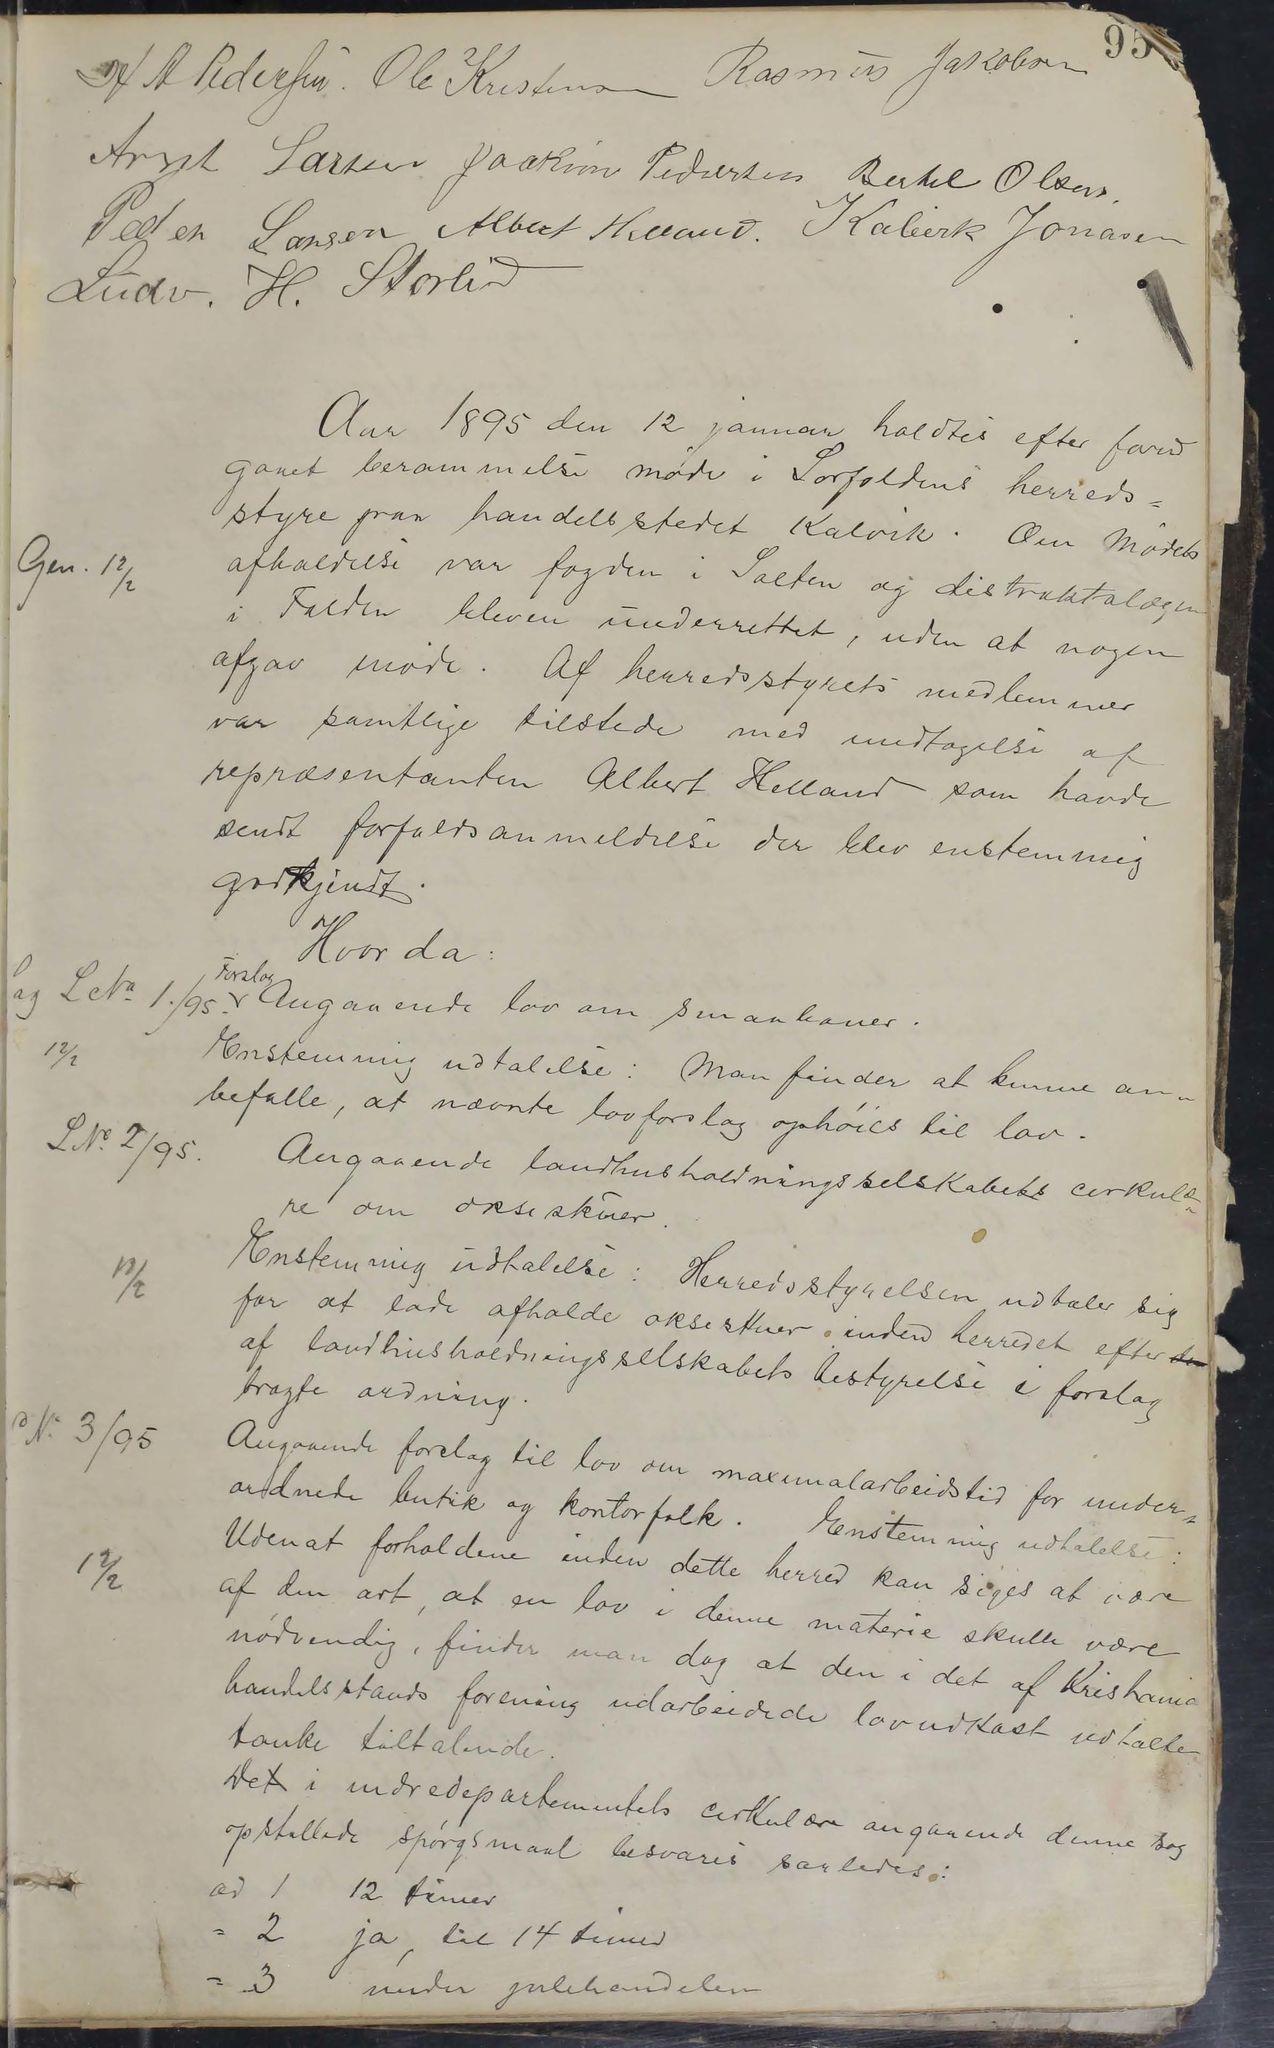 AIN, Sørfold kommune. Formannskap, 100/L0001: Forhandlingsprotokol for Sørfoldens formandskab, 1885-1902, p. 95